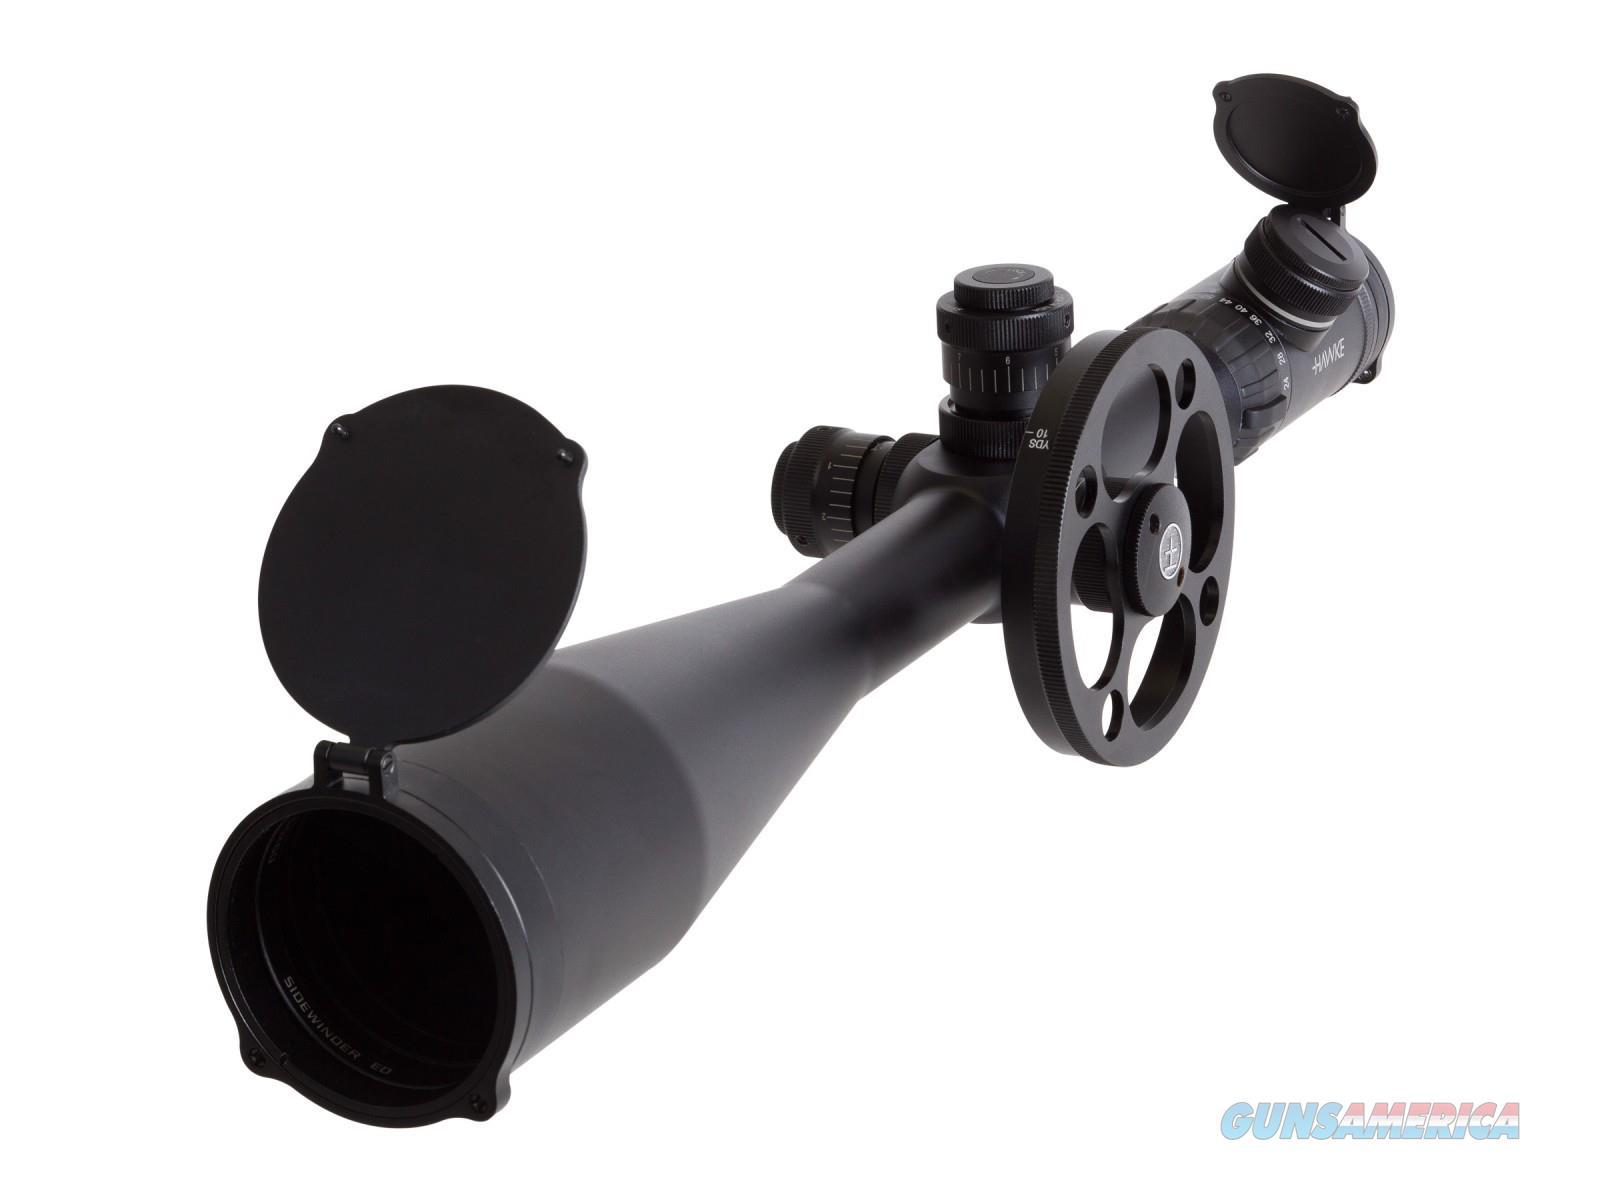 Hawke Sport Optics 10-50x60 ED Sidewinder Rifle Scope Illuminated Etched  Glass